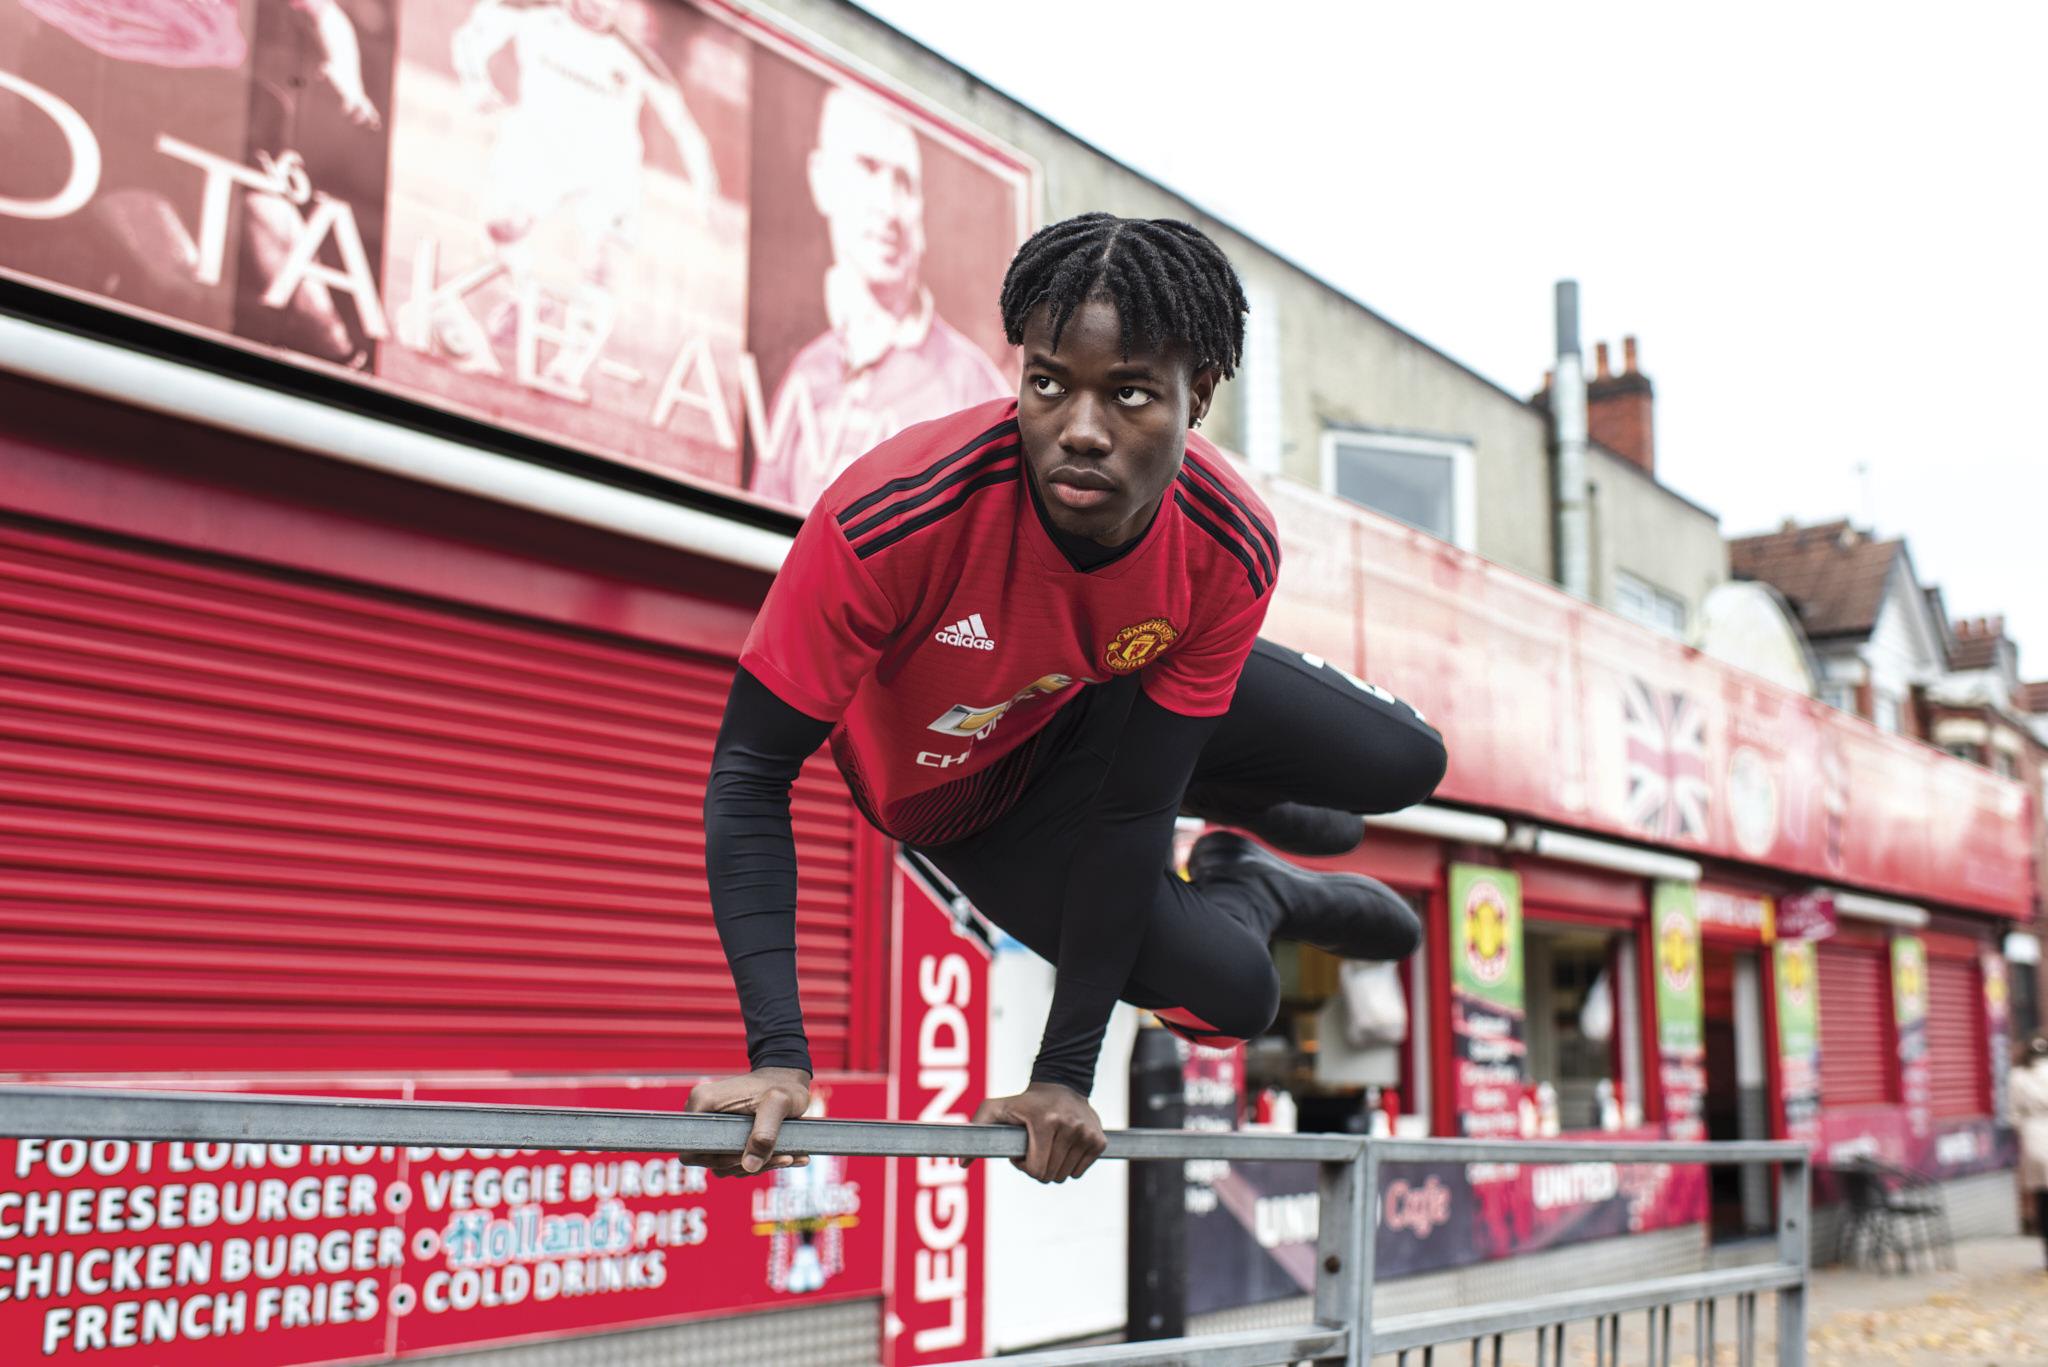 Glory by Nick Pecori Photographer Manchester United Adidas Kith Parley Miami 59.jpg